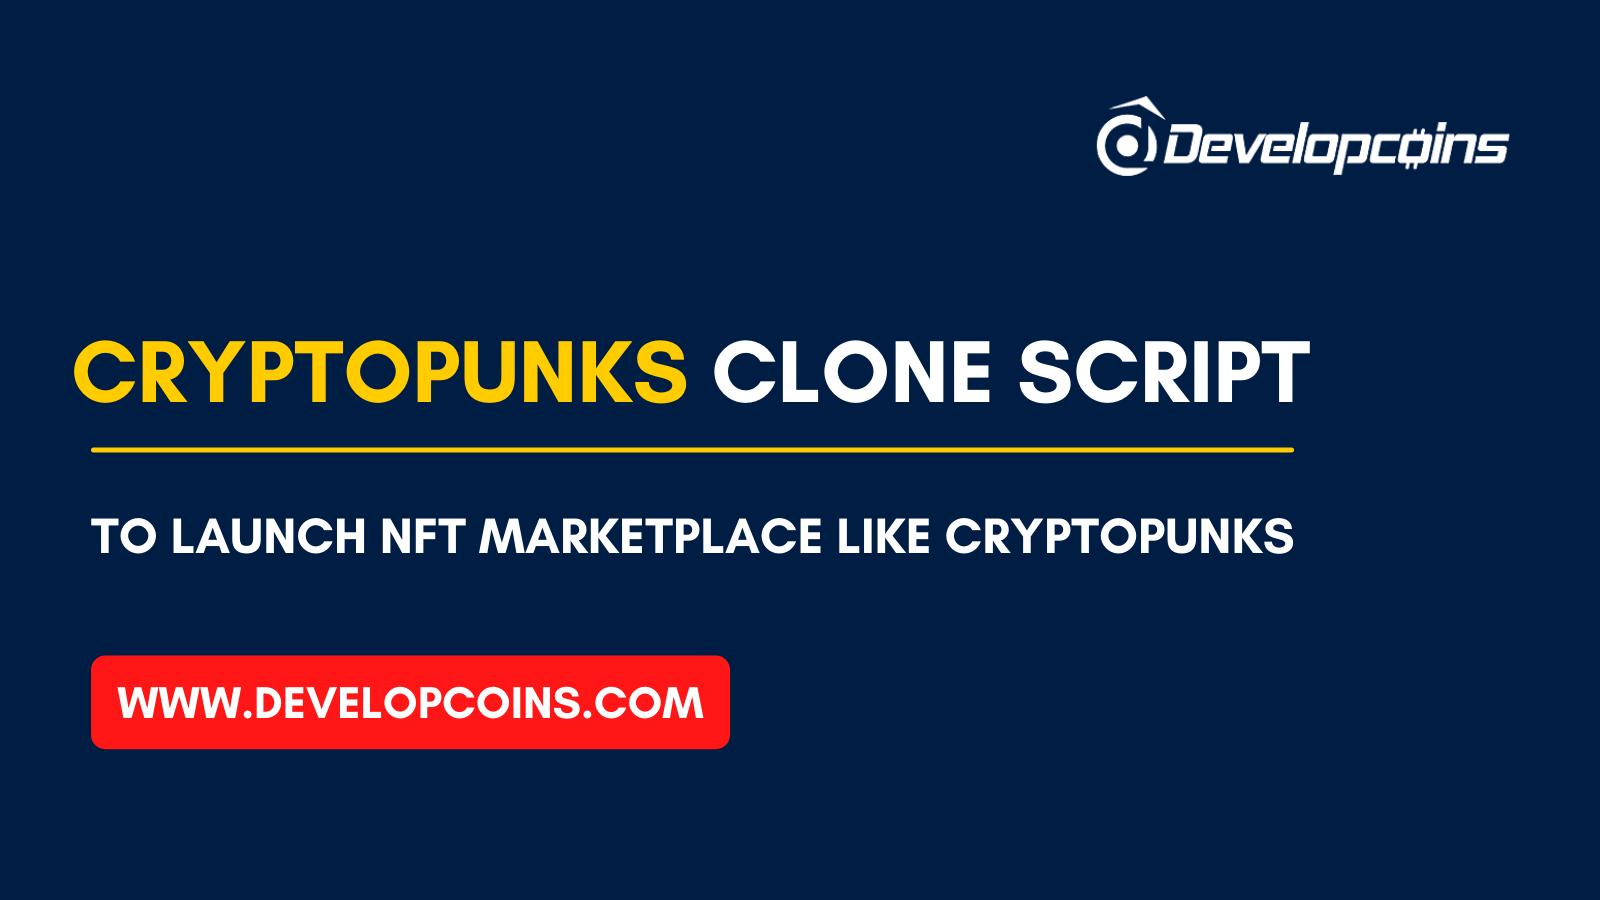 CryptoPunks Clone Script | Launch your own NFT Marketplace  Platform Like CryptoPunks